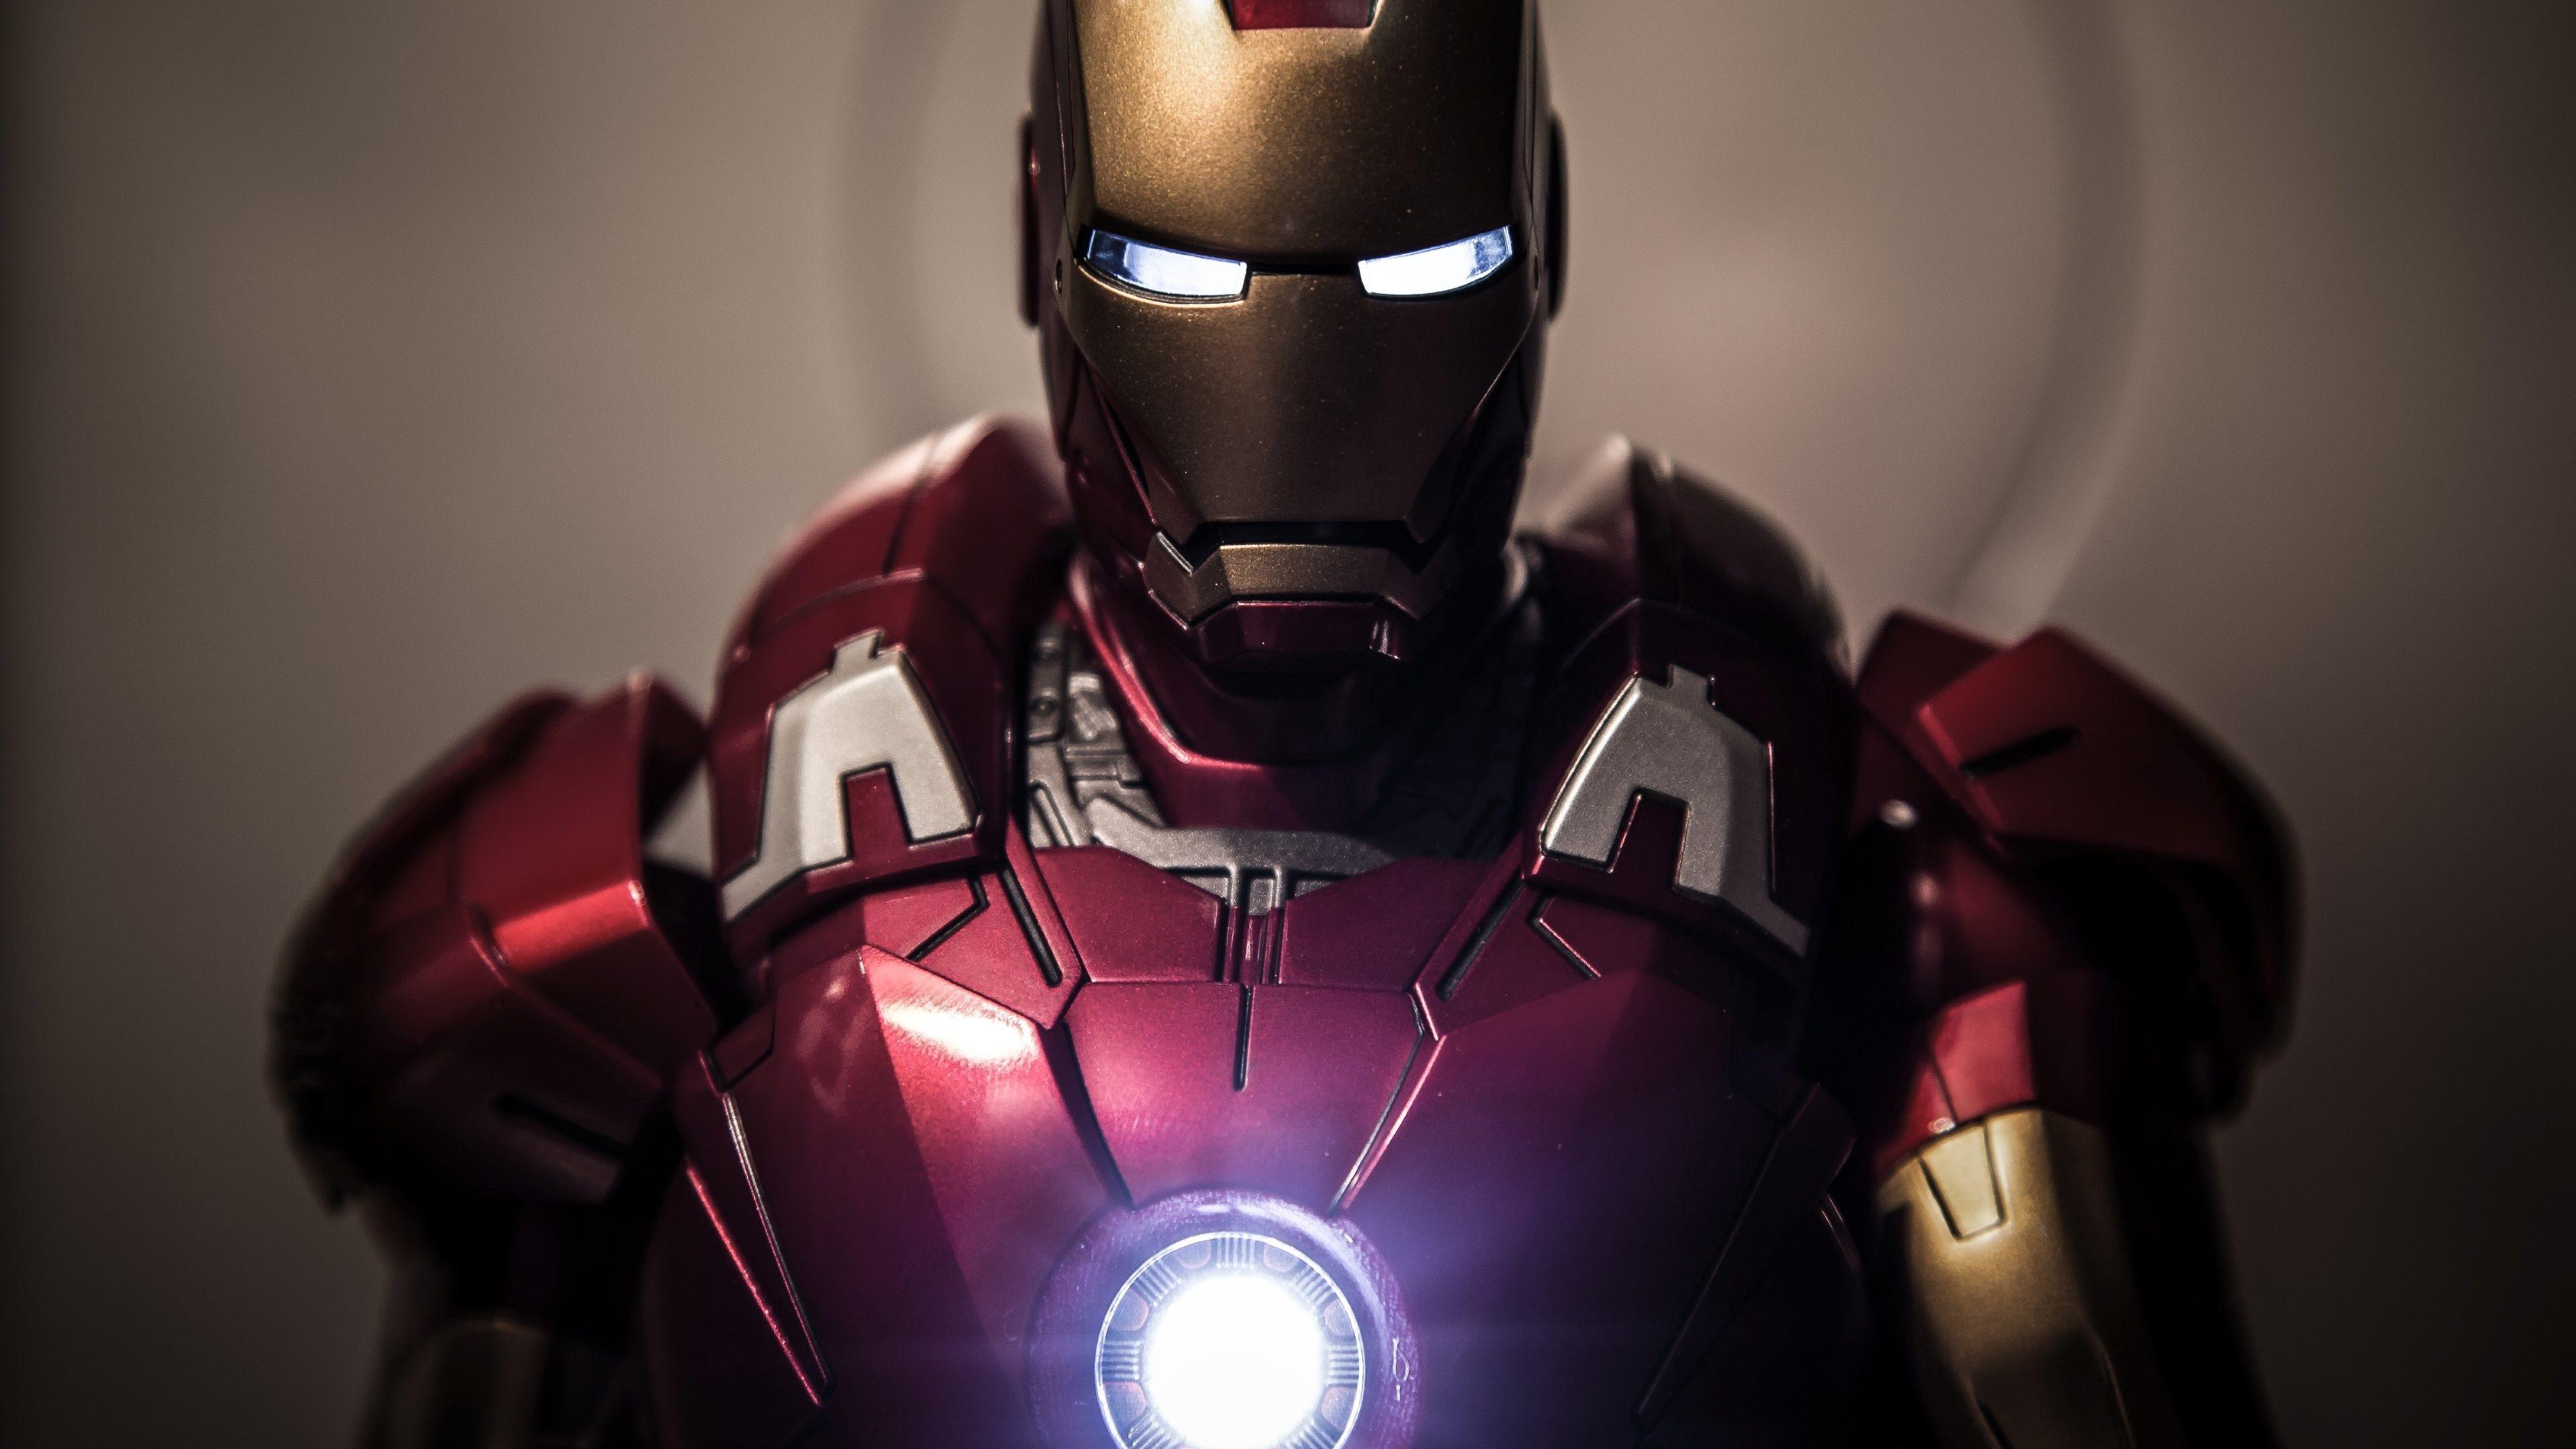 iron man 4k wallpaper (3840x2160) (With images) Iron man